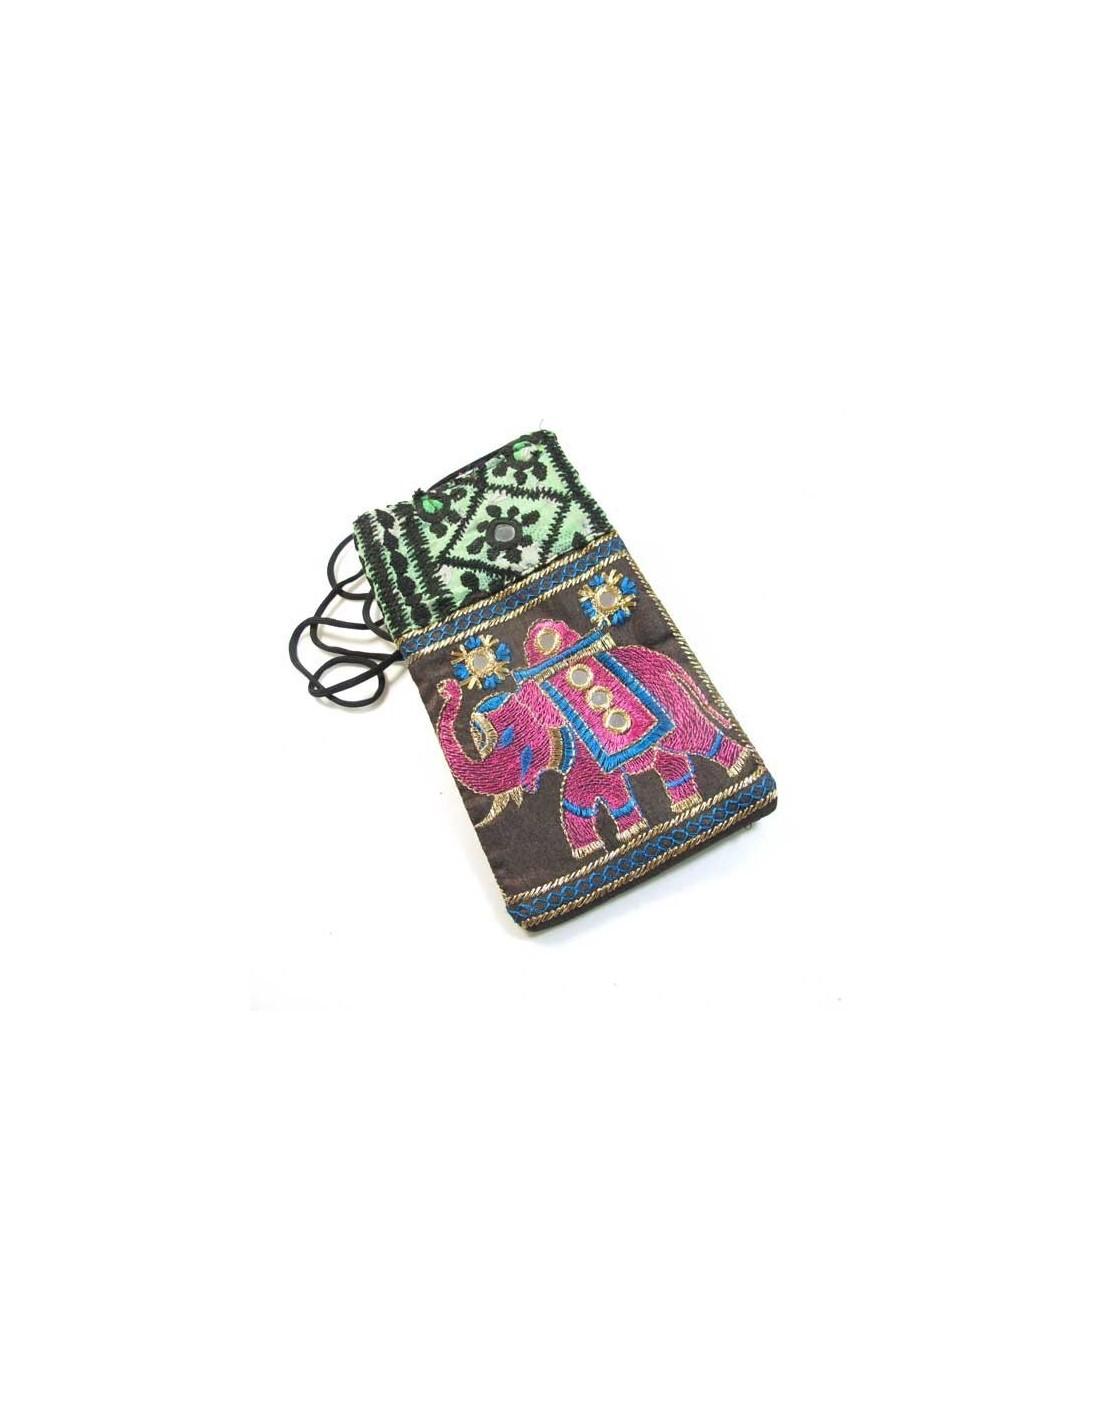 pochette brod e pour telephone portable pochettes indiennes color es po21. Black Bedroom Furniture Sets. Home Design Ideas